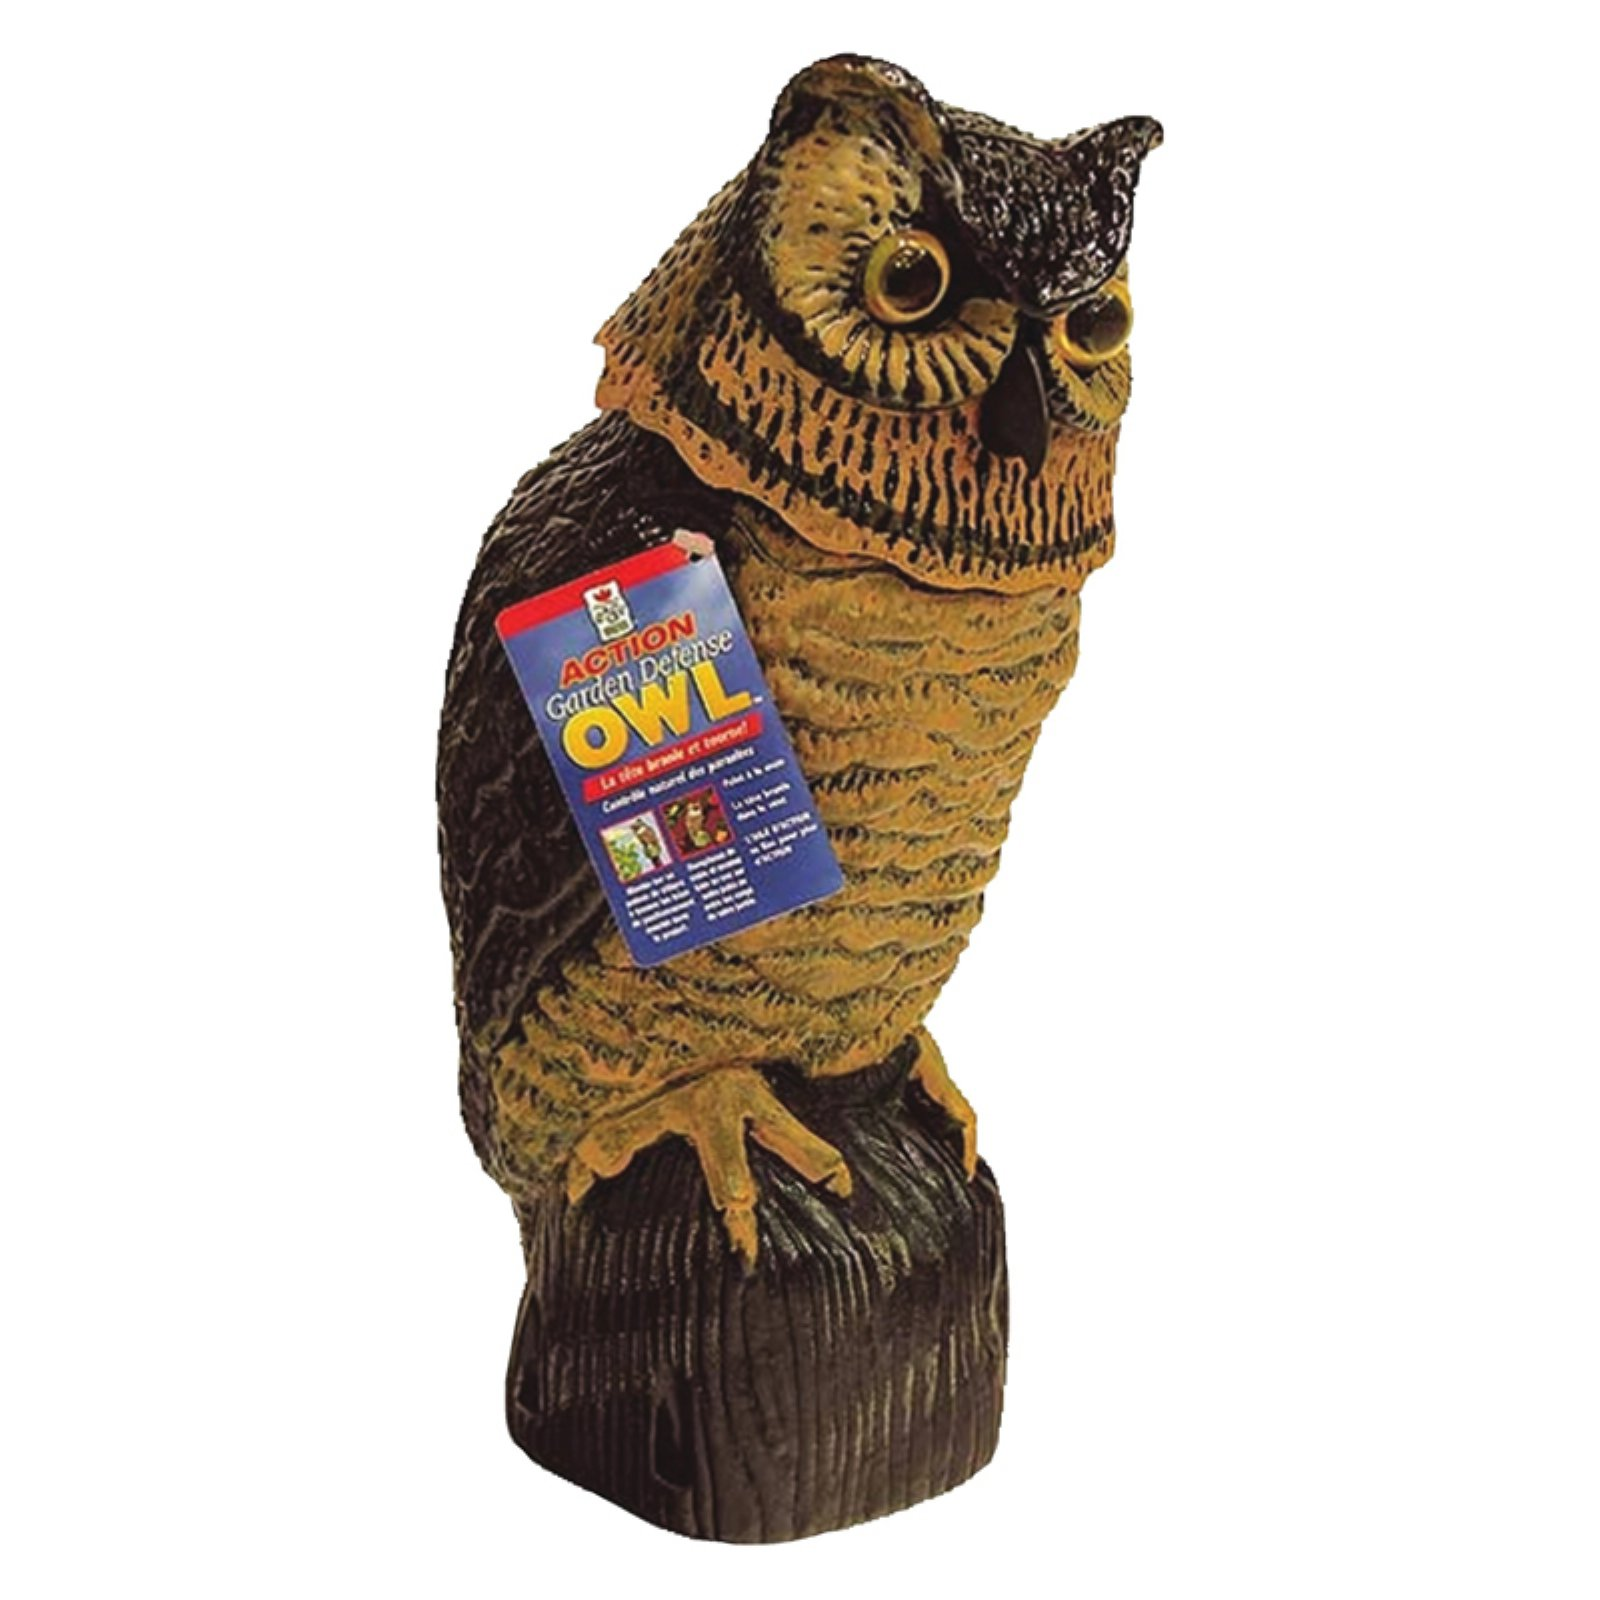 Easy Gardener 8001 Garden Defense Owl Walmartcom